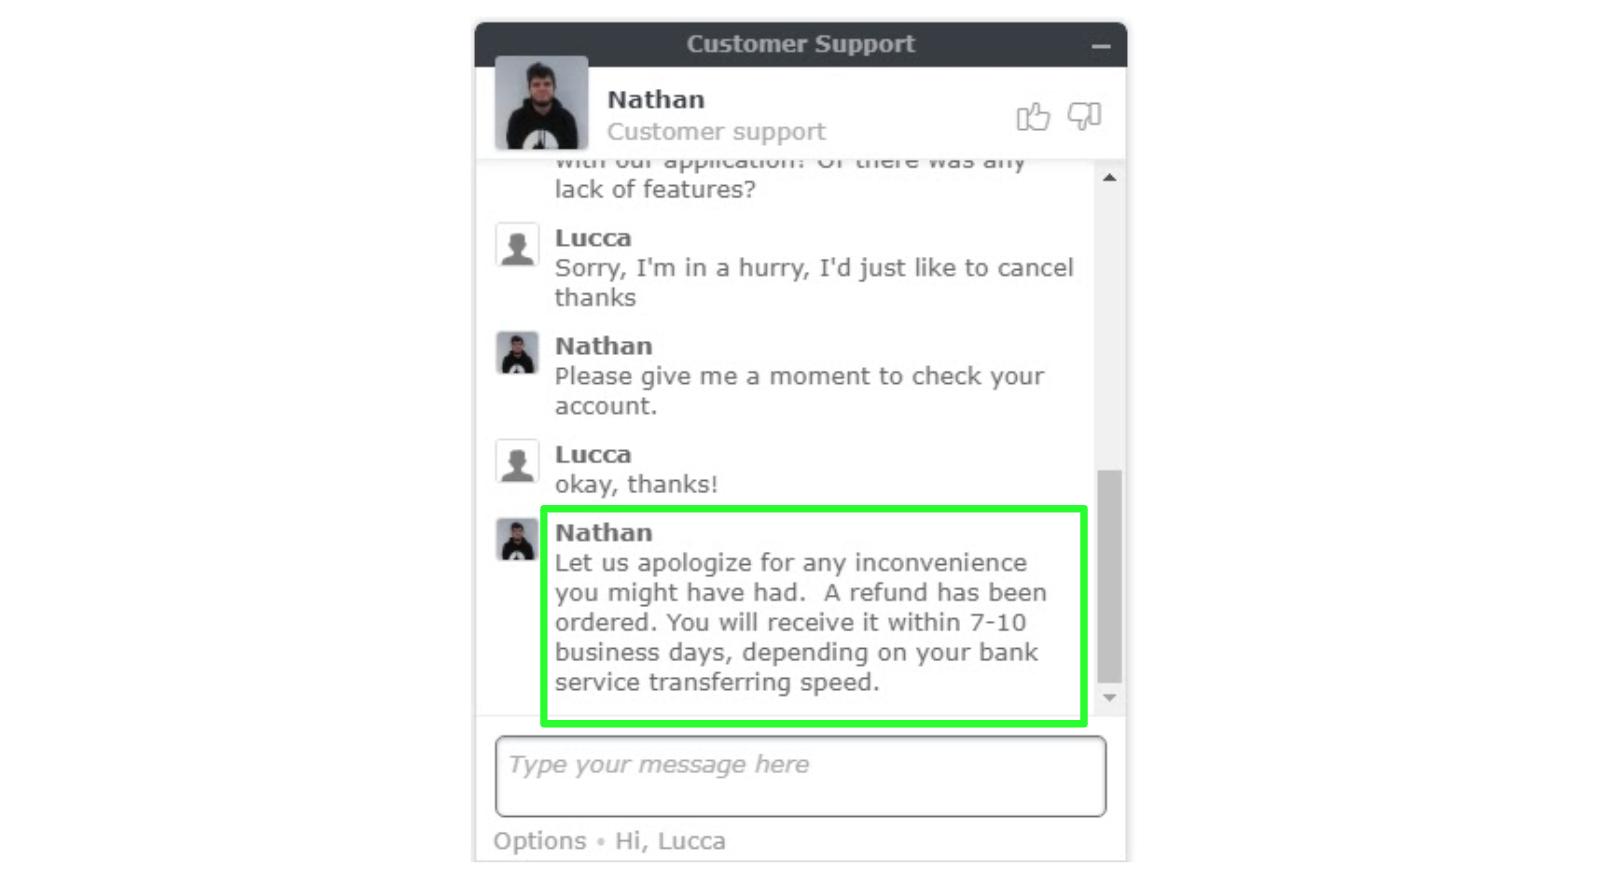 Cuplikan layar permintaan pengembalian dana dengan agen dukungan pelanggan NordVPN pada obrolan langsung